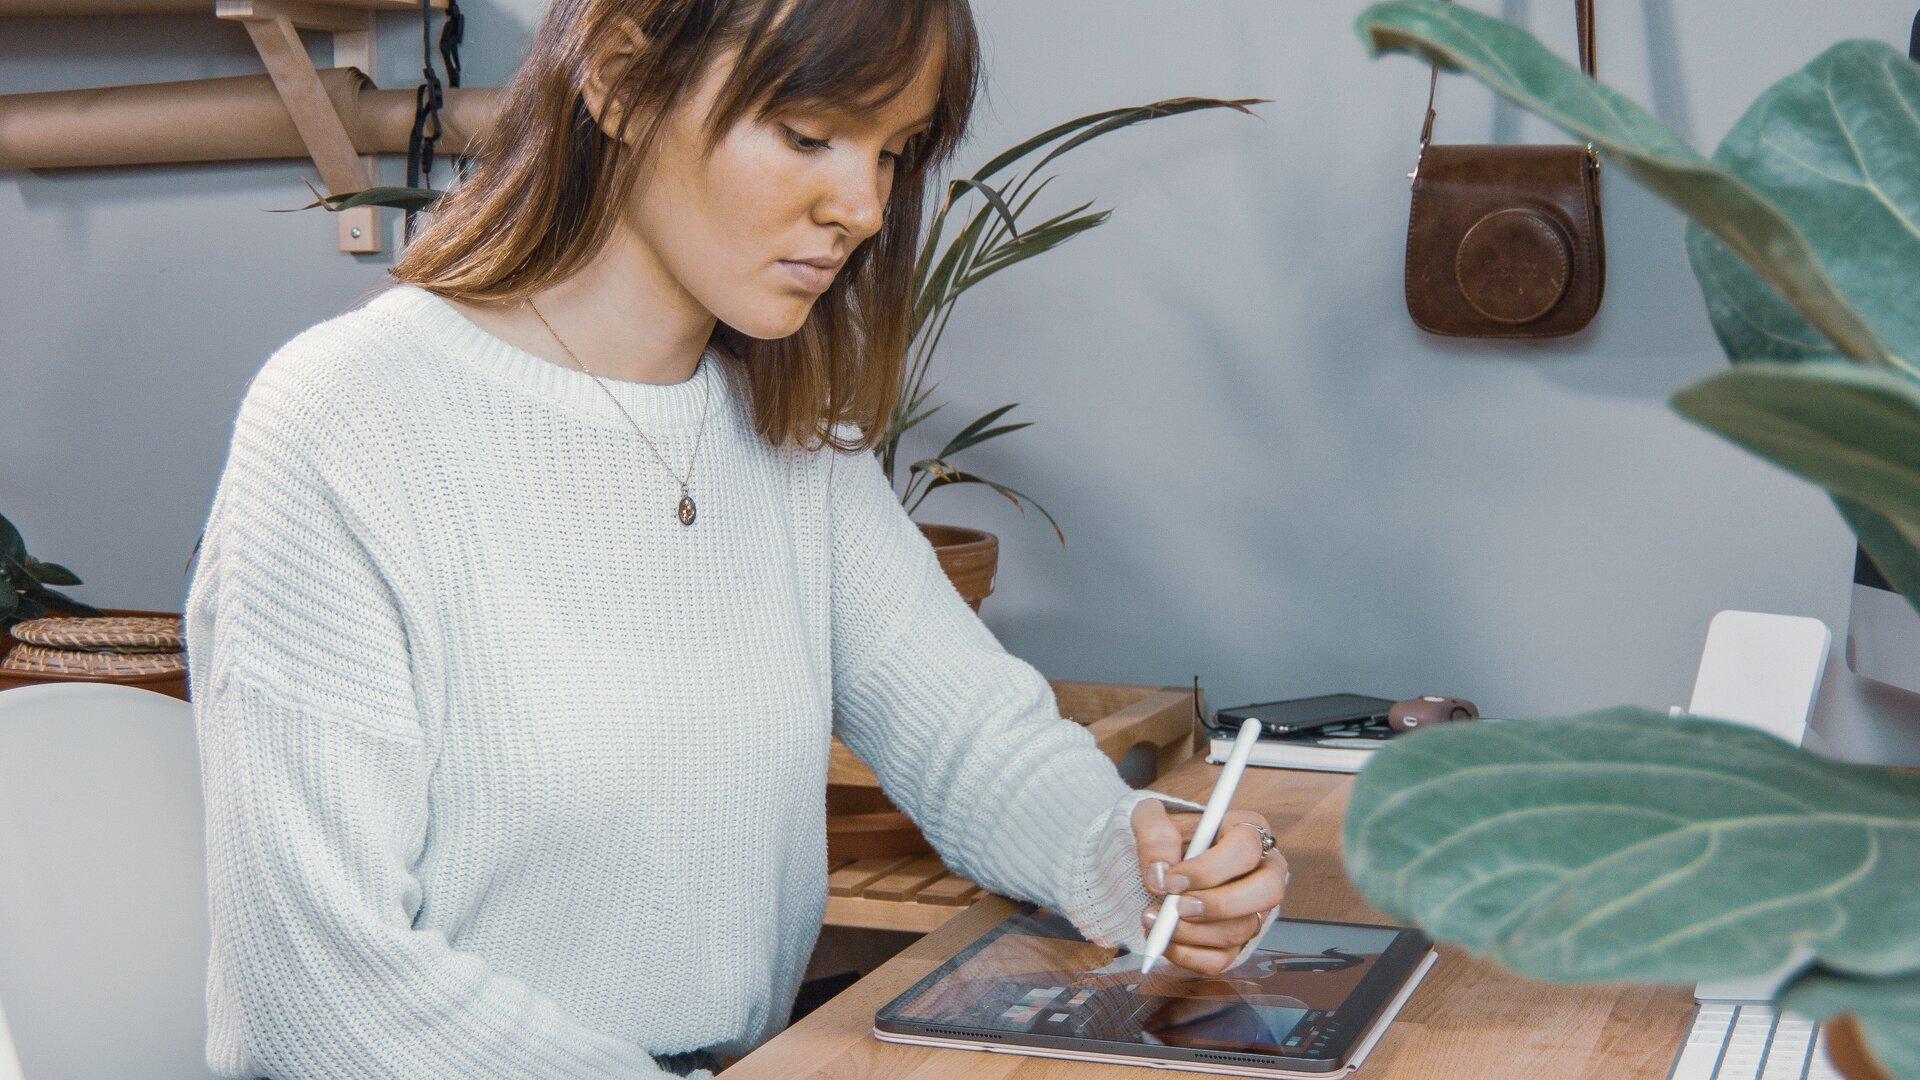 Sara Faber is Illustrating a Successful Creative Career